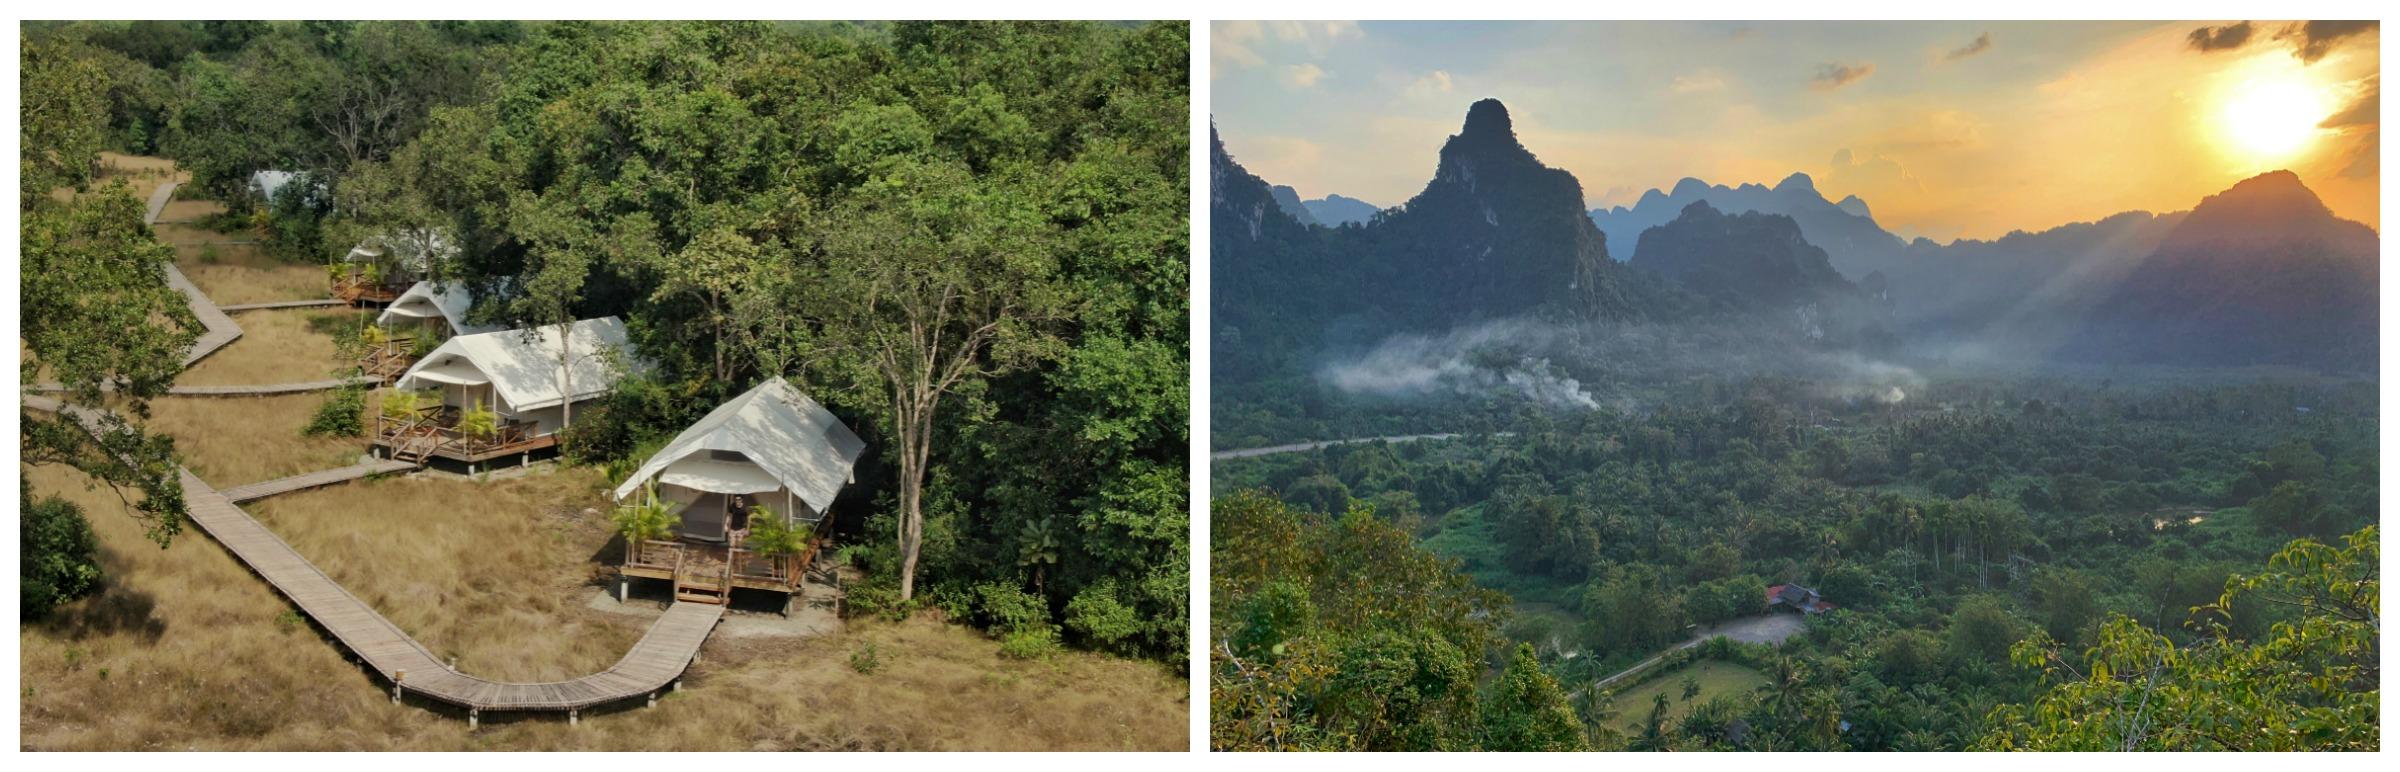 Cardamom Tented Camp and Anurak Community Lodge